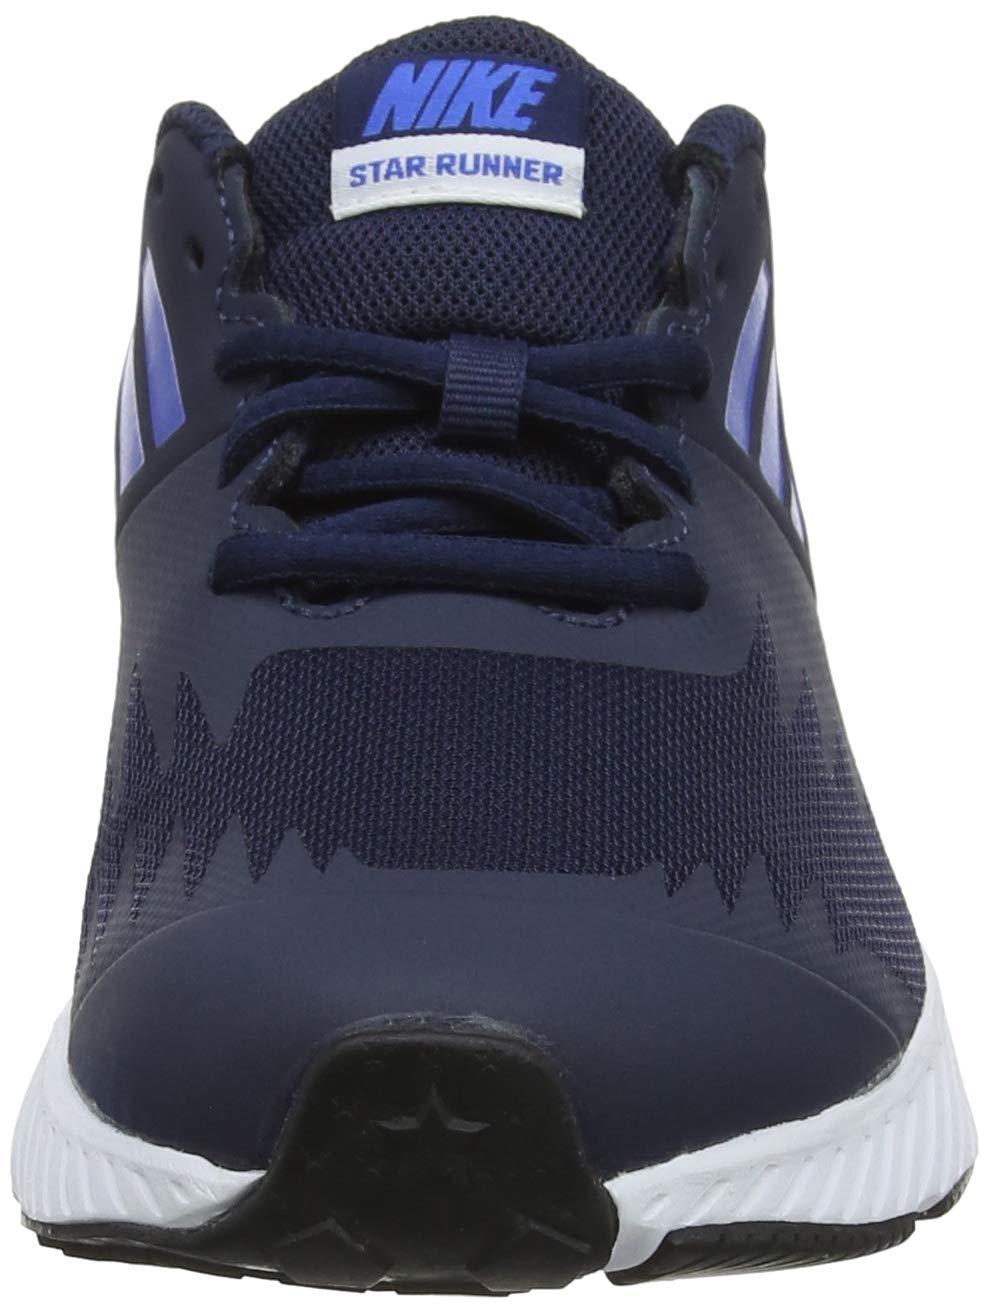 Nike Boy's Star Runner (GS) Running Shoe Obsidian/Metallic Silver/Signal Blue Size 3.5 M US by Nike (Image #4)